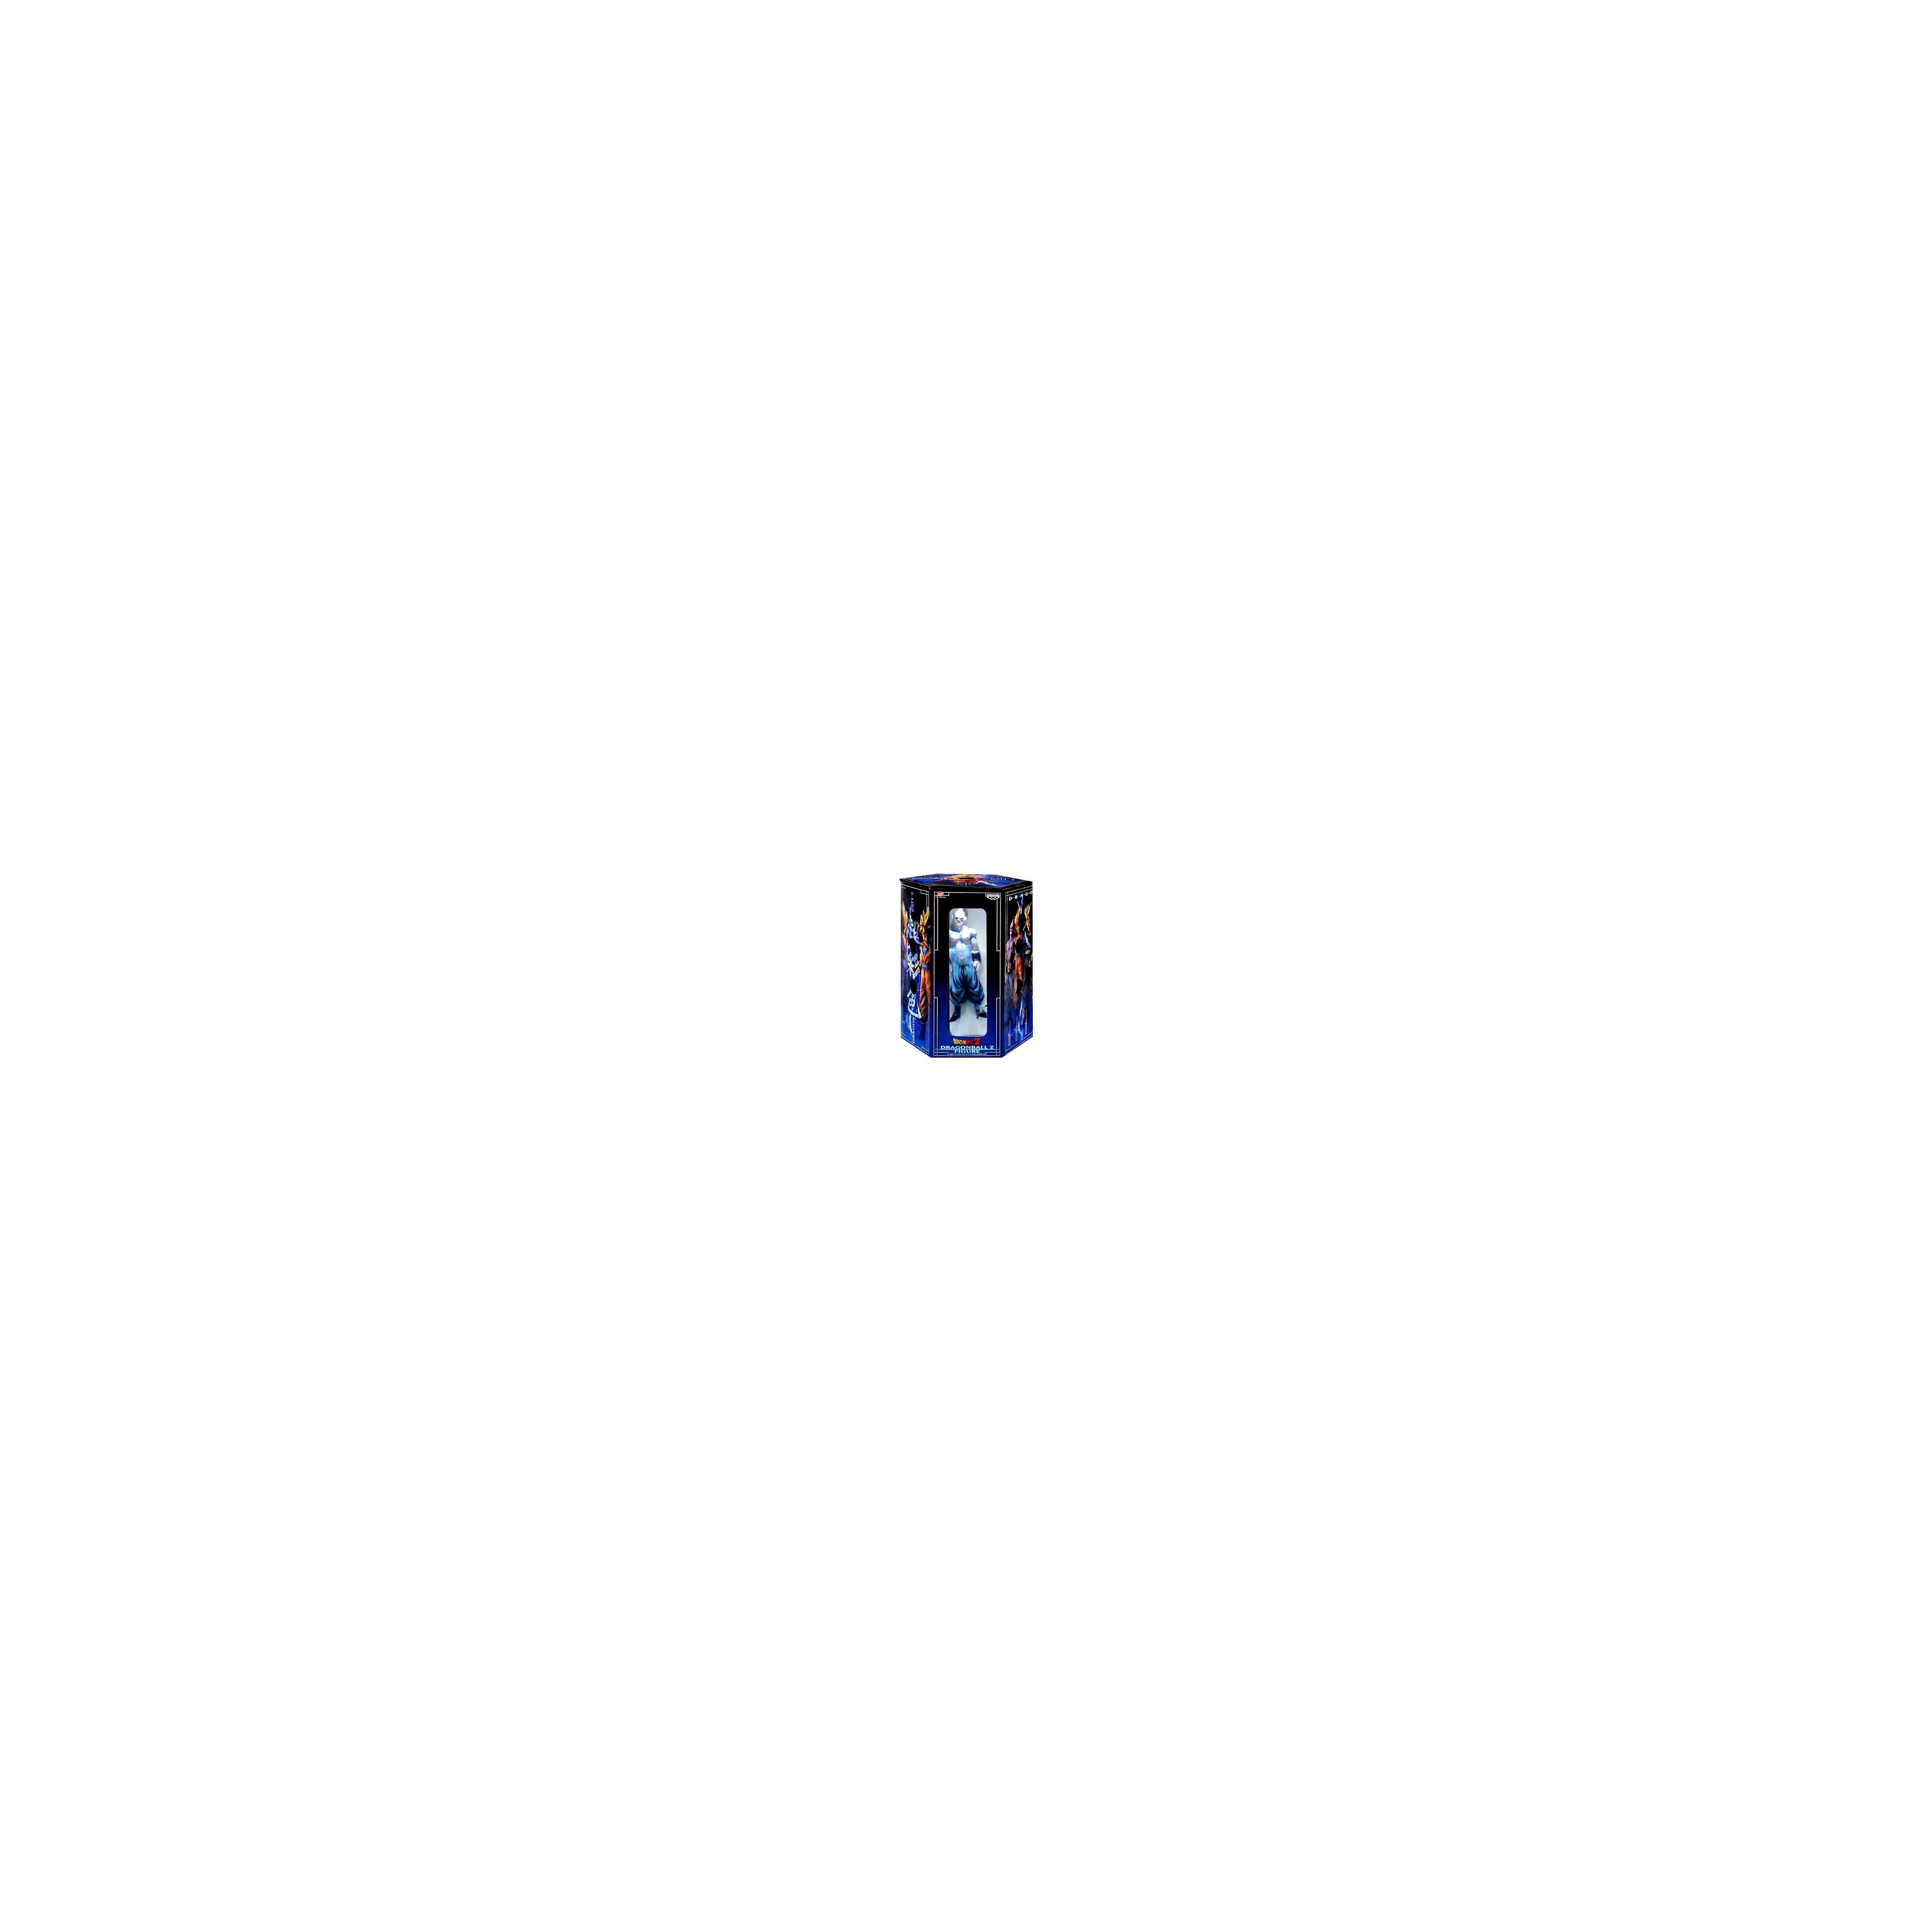 Dragonball Z Banpresto 5 Inch #007 Super Buu